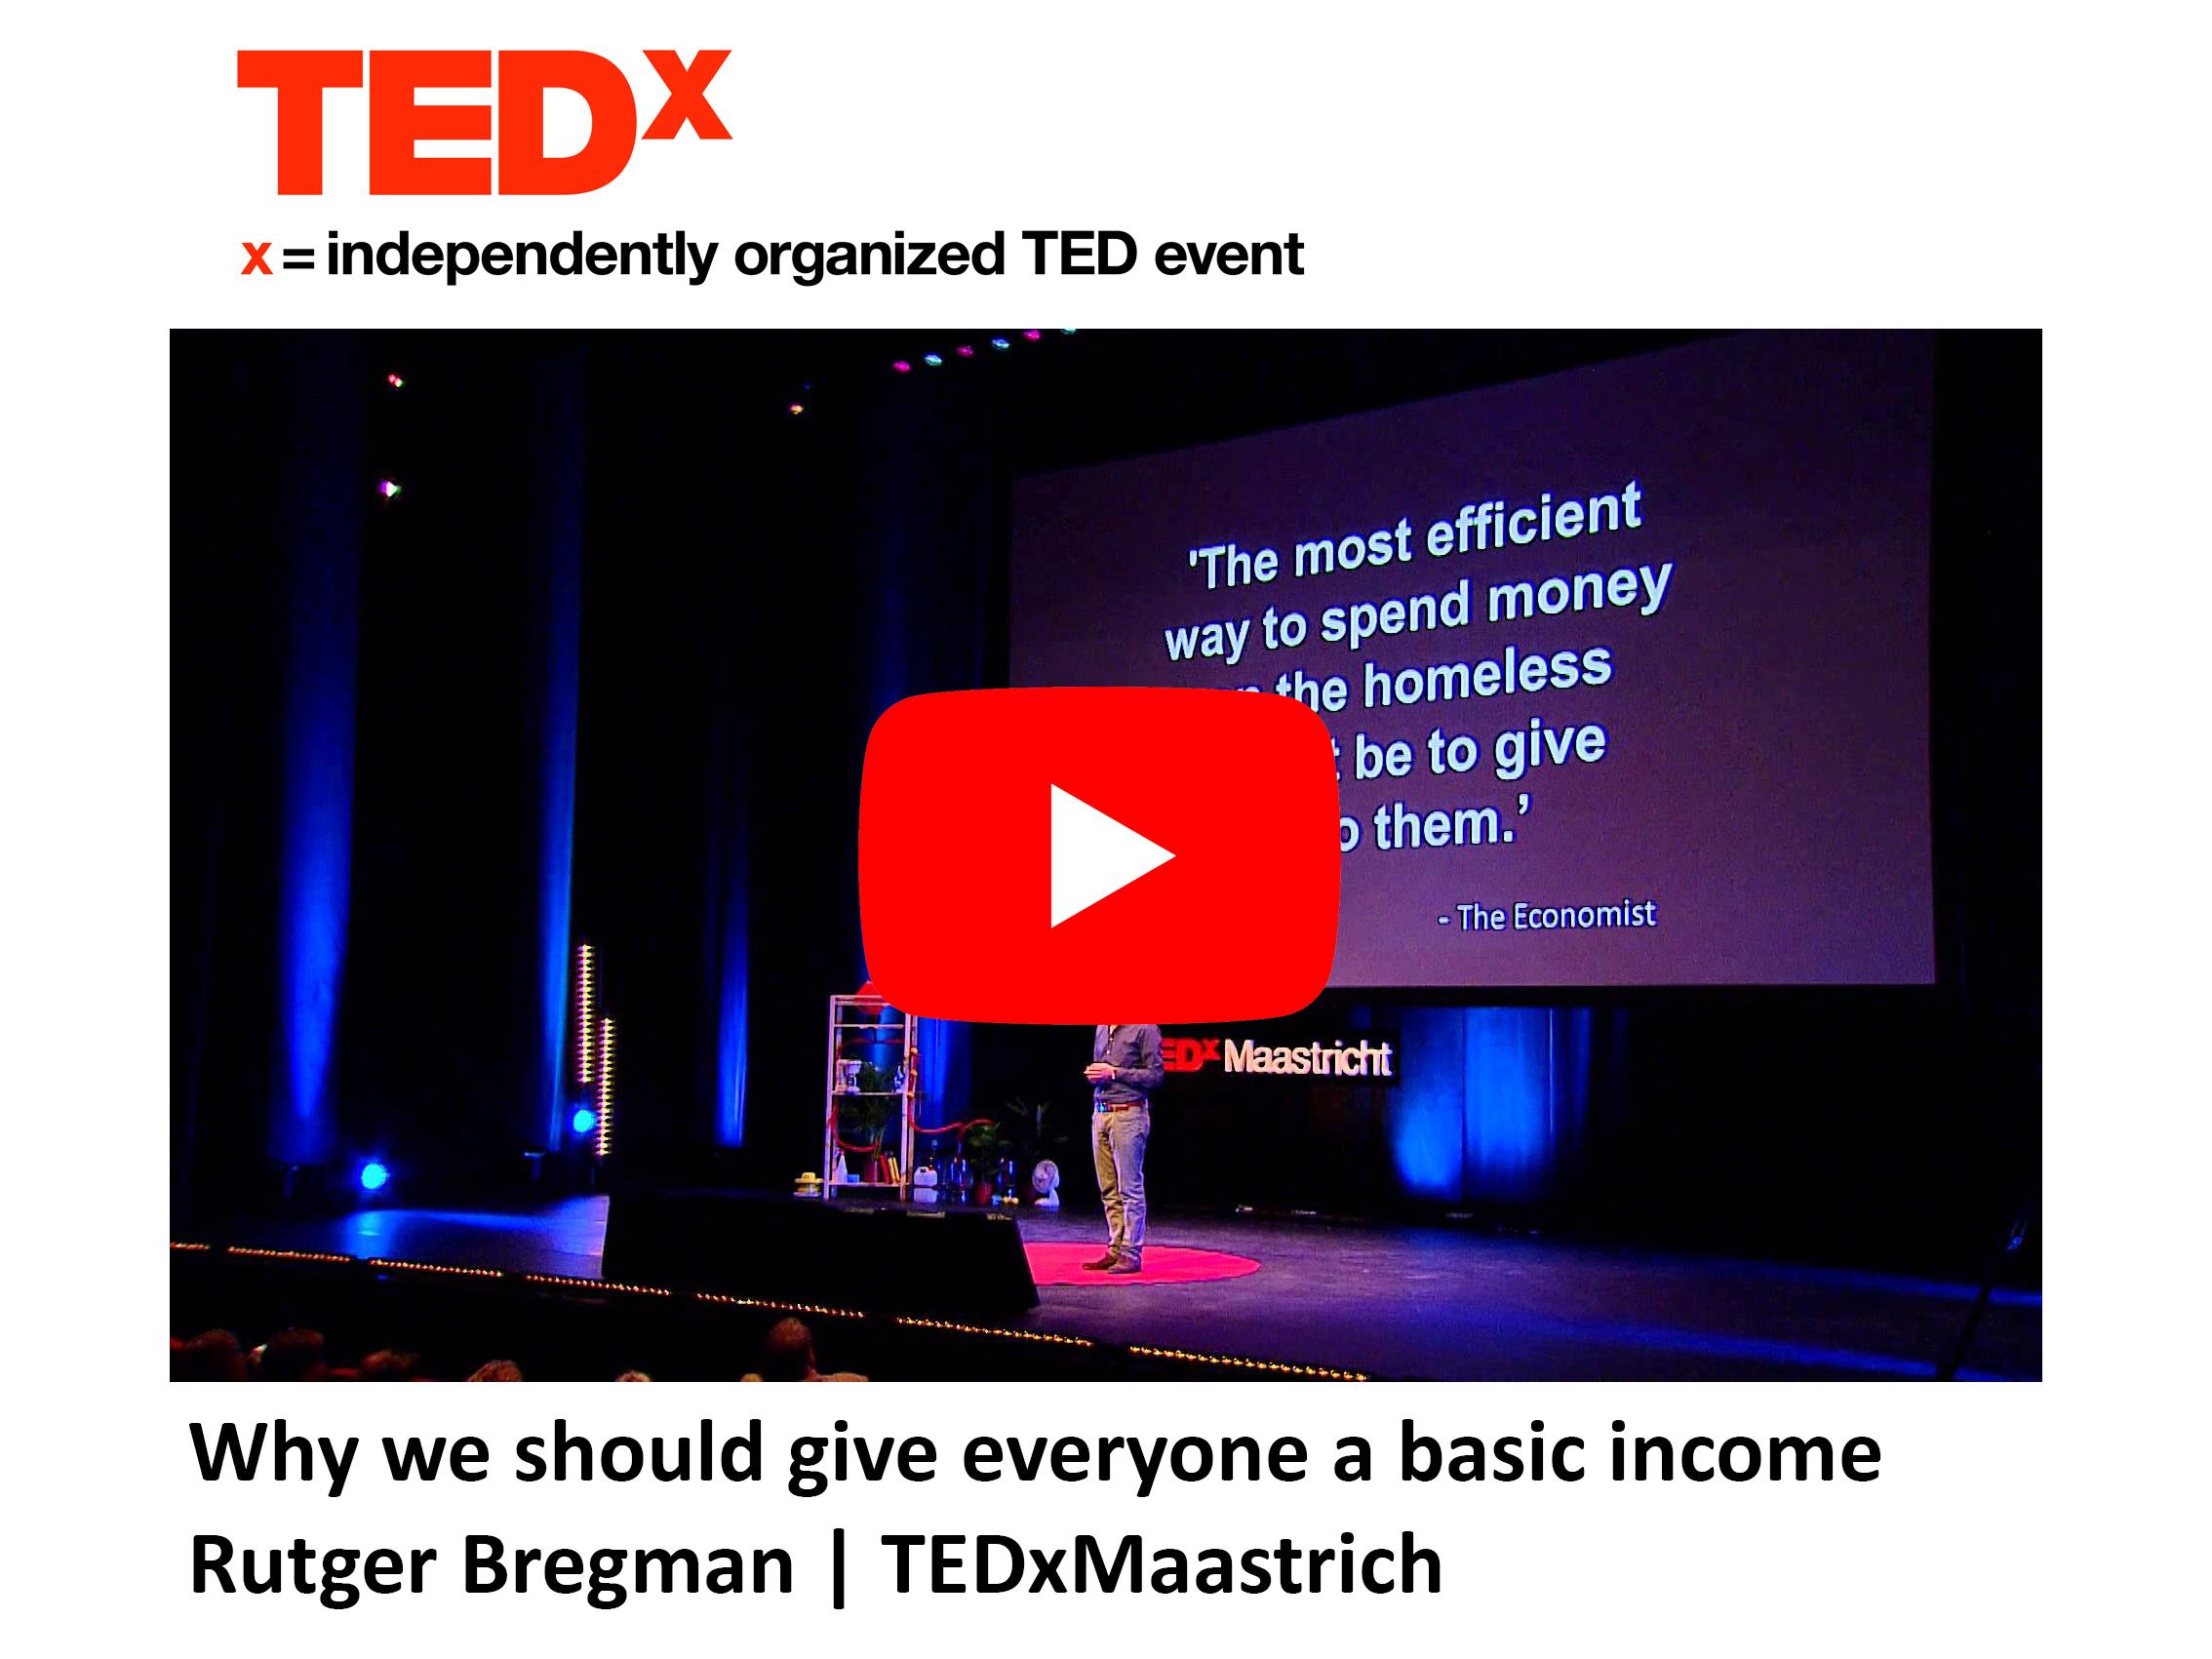 TEDx - Why we should give everyone a UBI